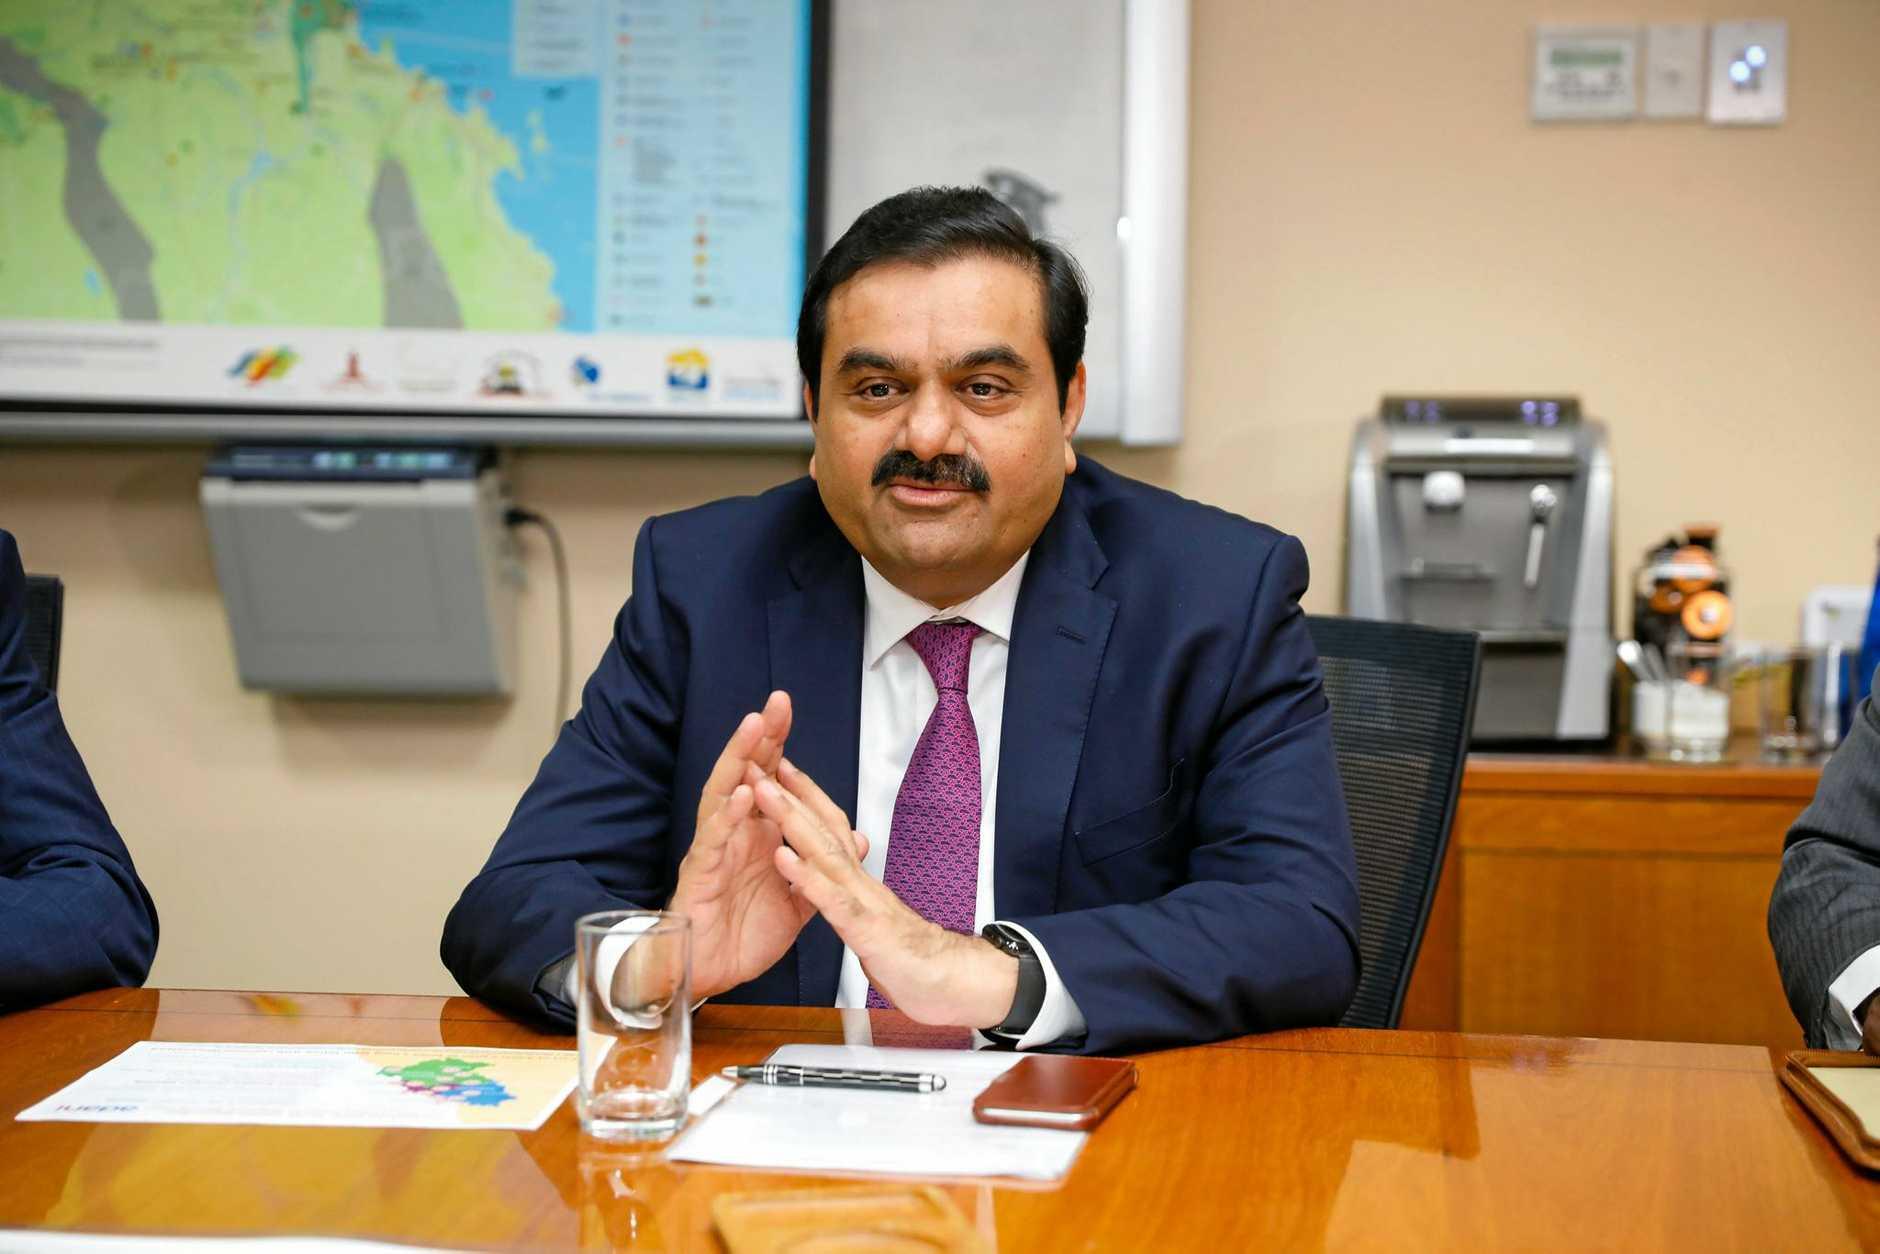 Adani Group chairman Gautam Adani (AAP Image/ Cameron Laird)